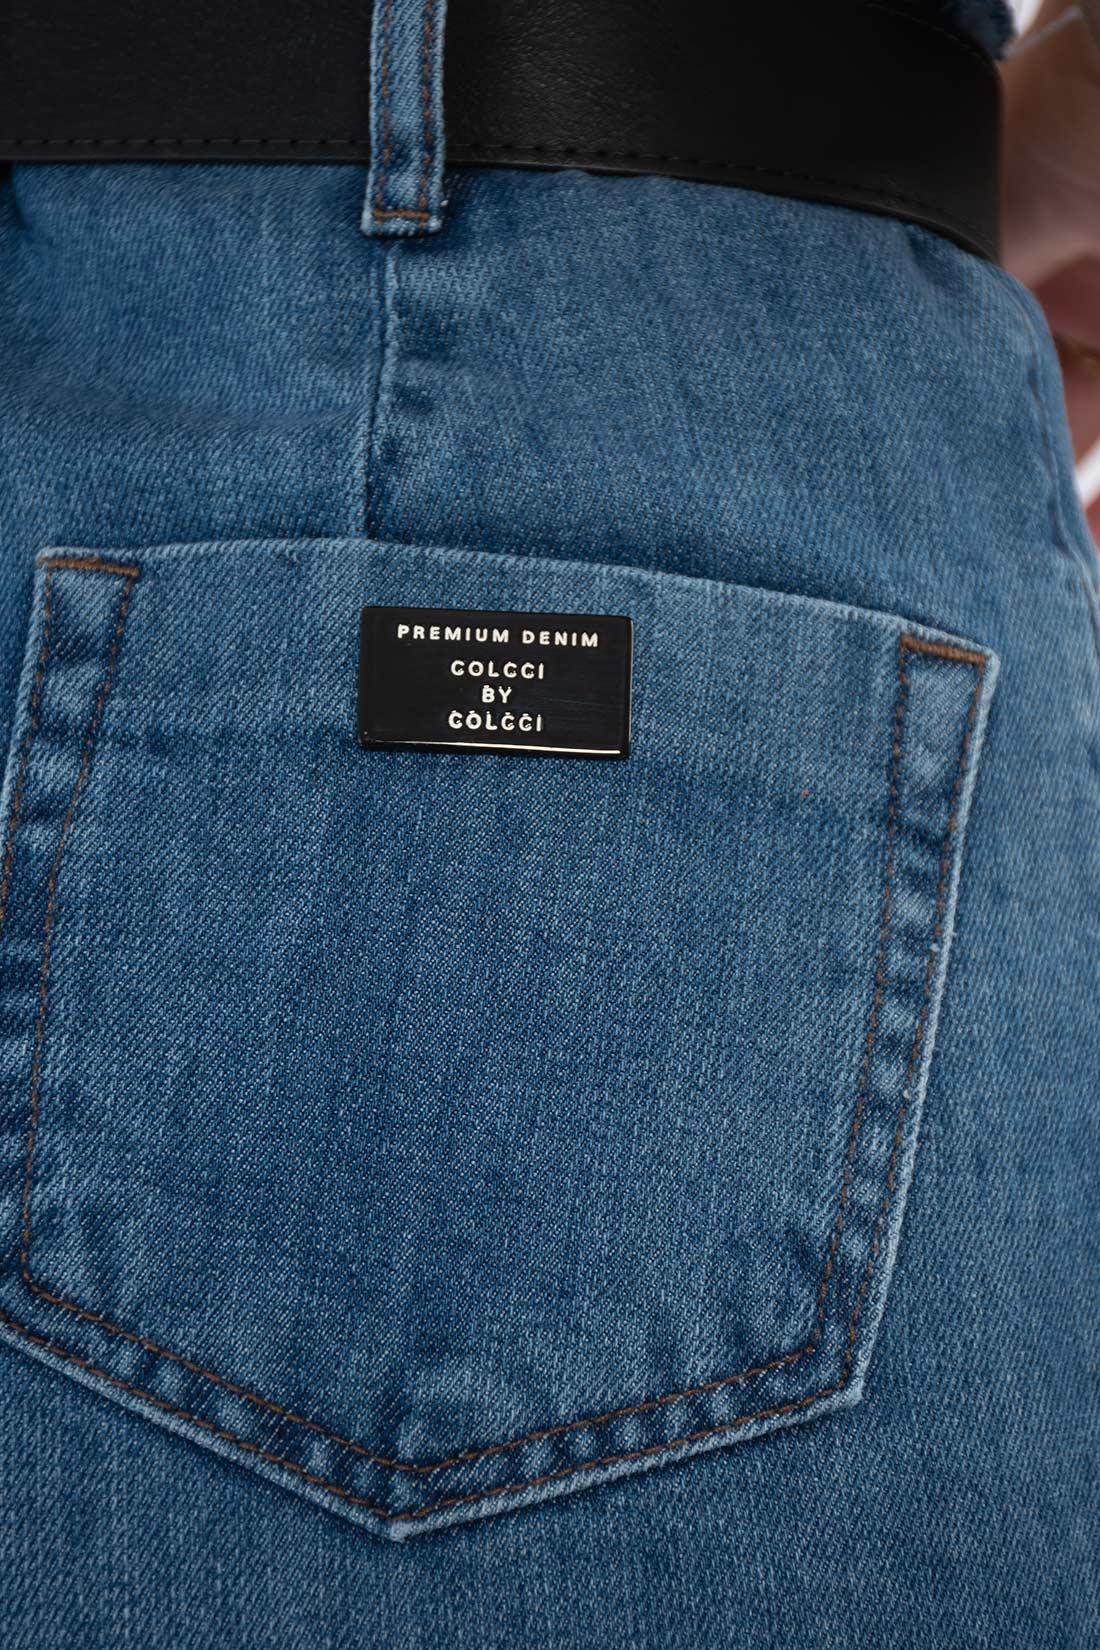 Shorts Jeans Colcci Suzie Com Cinto